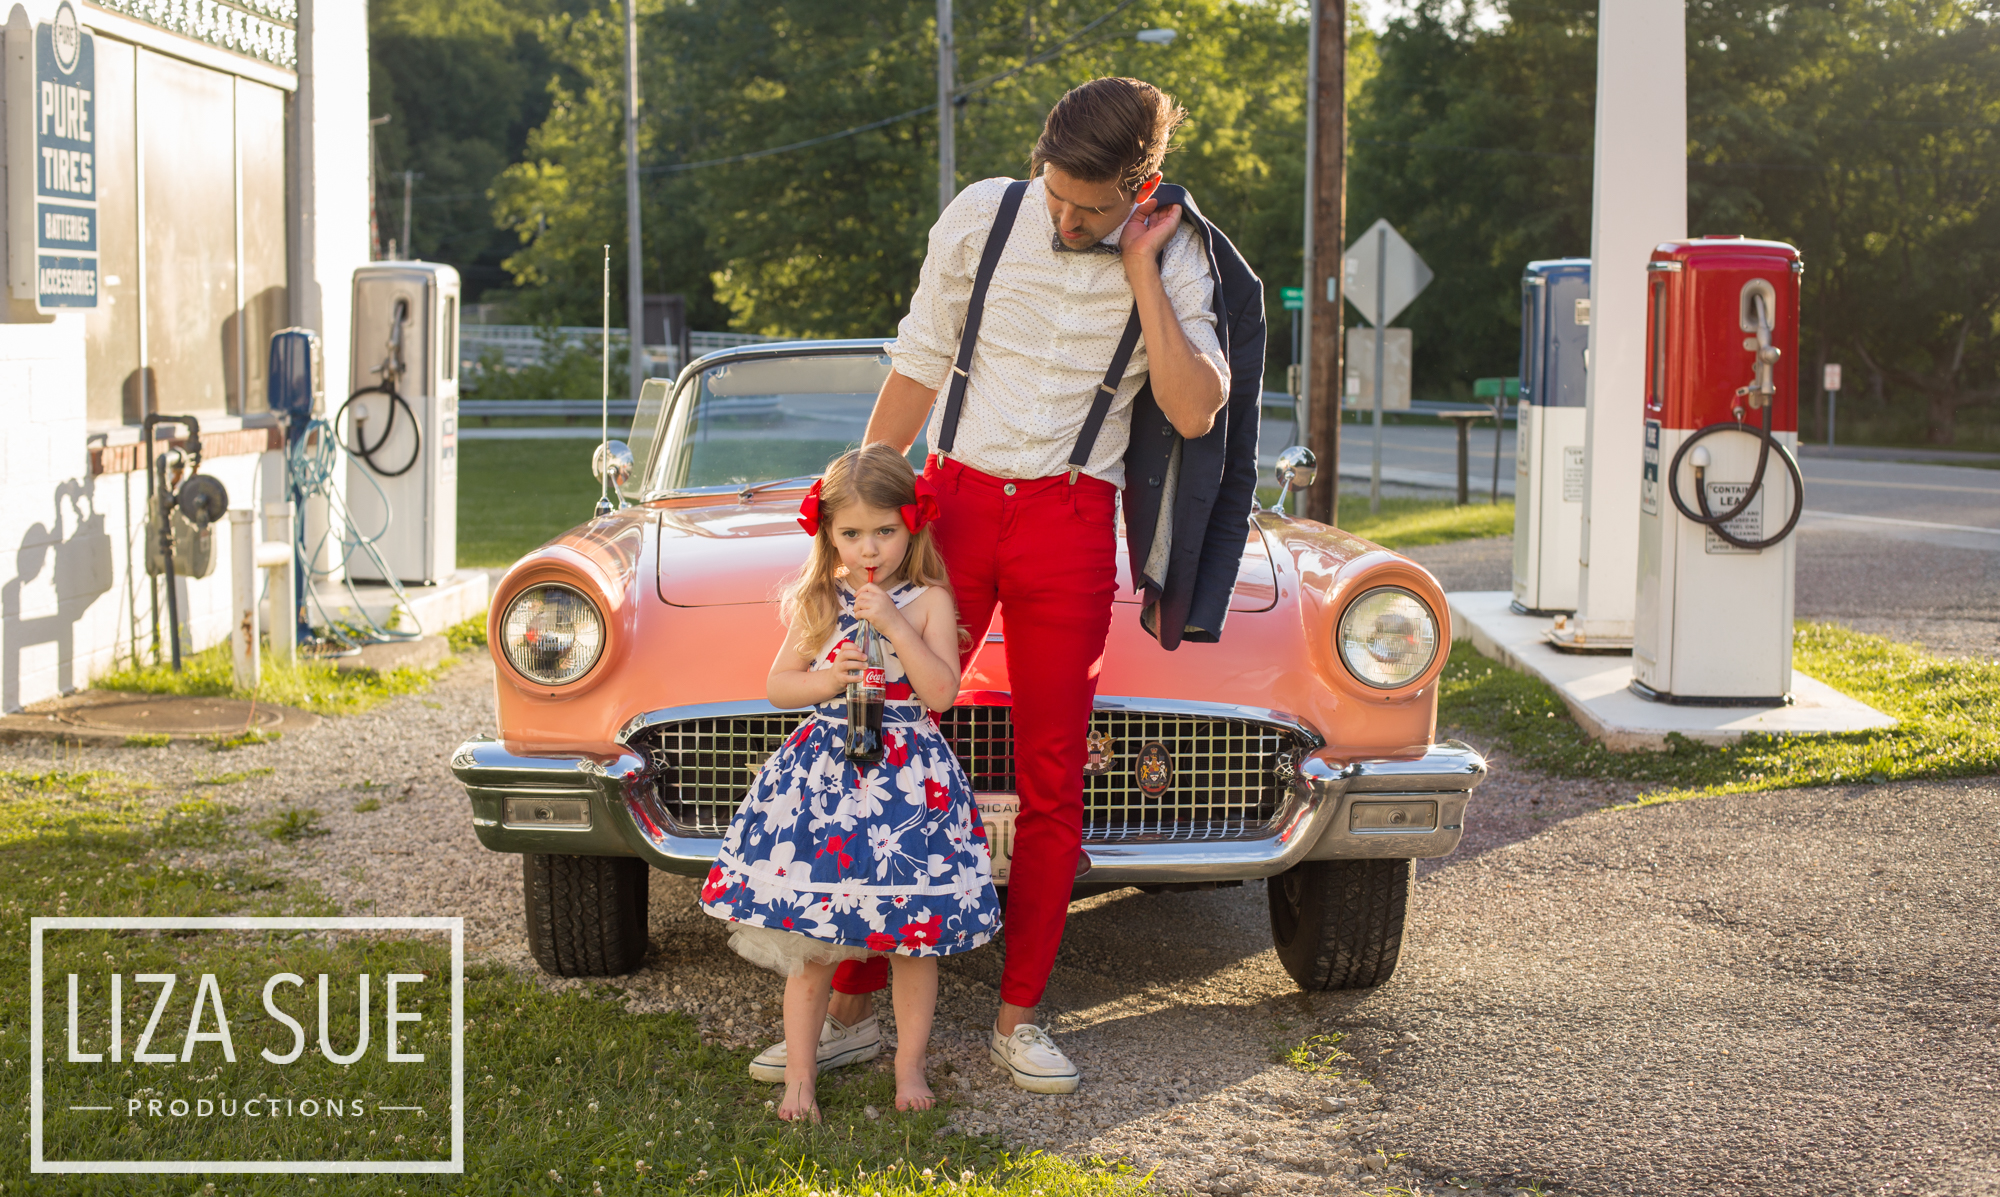 cleveland + akron vintage family photoshoot retro car 1950s